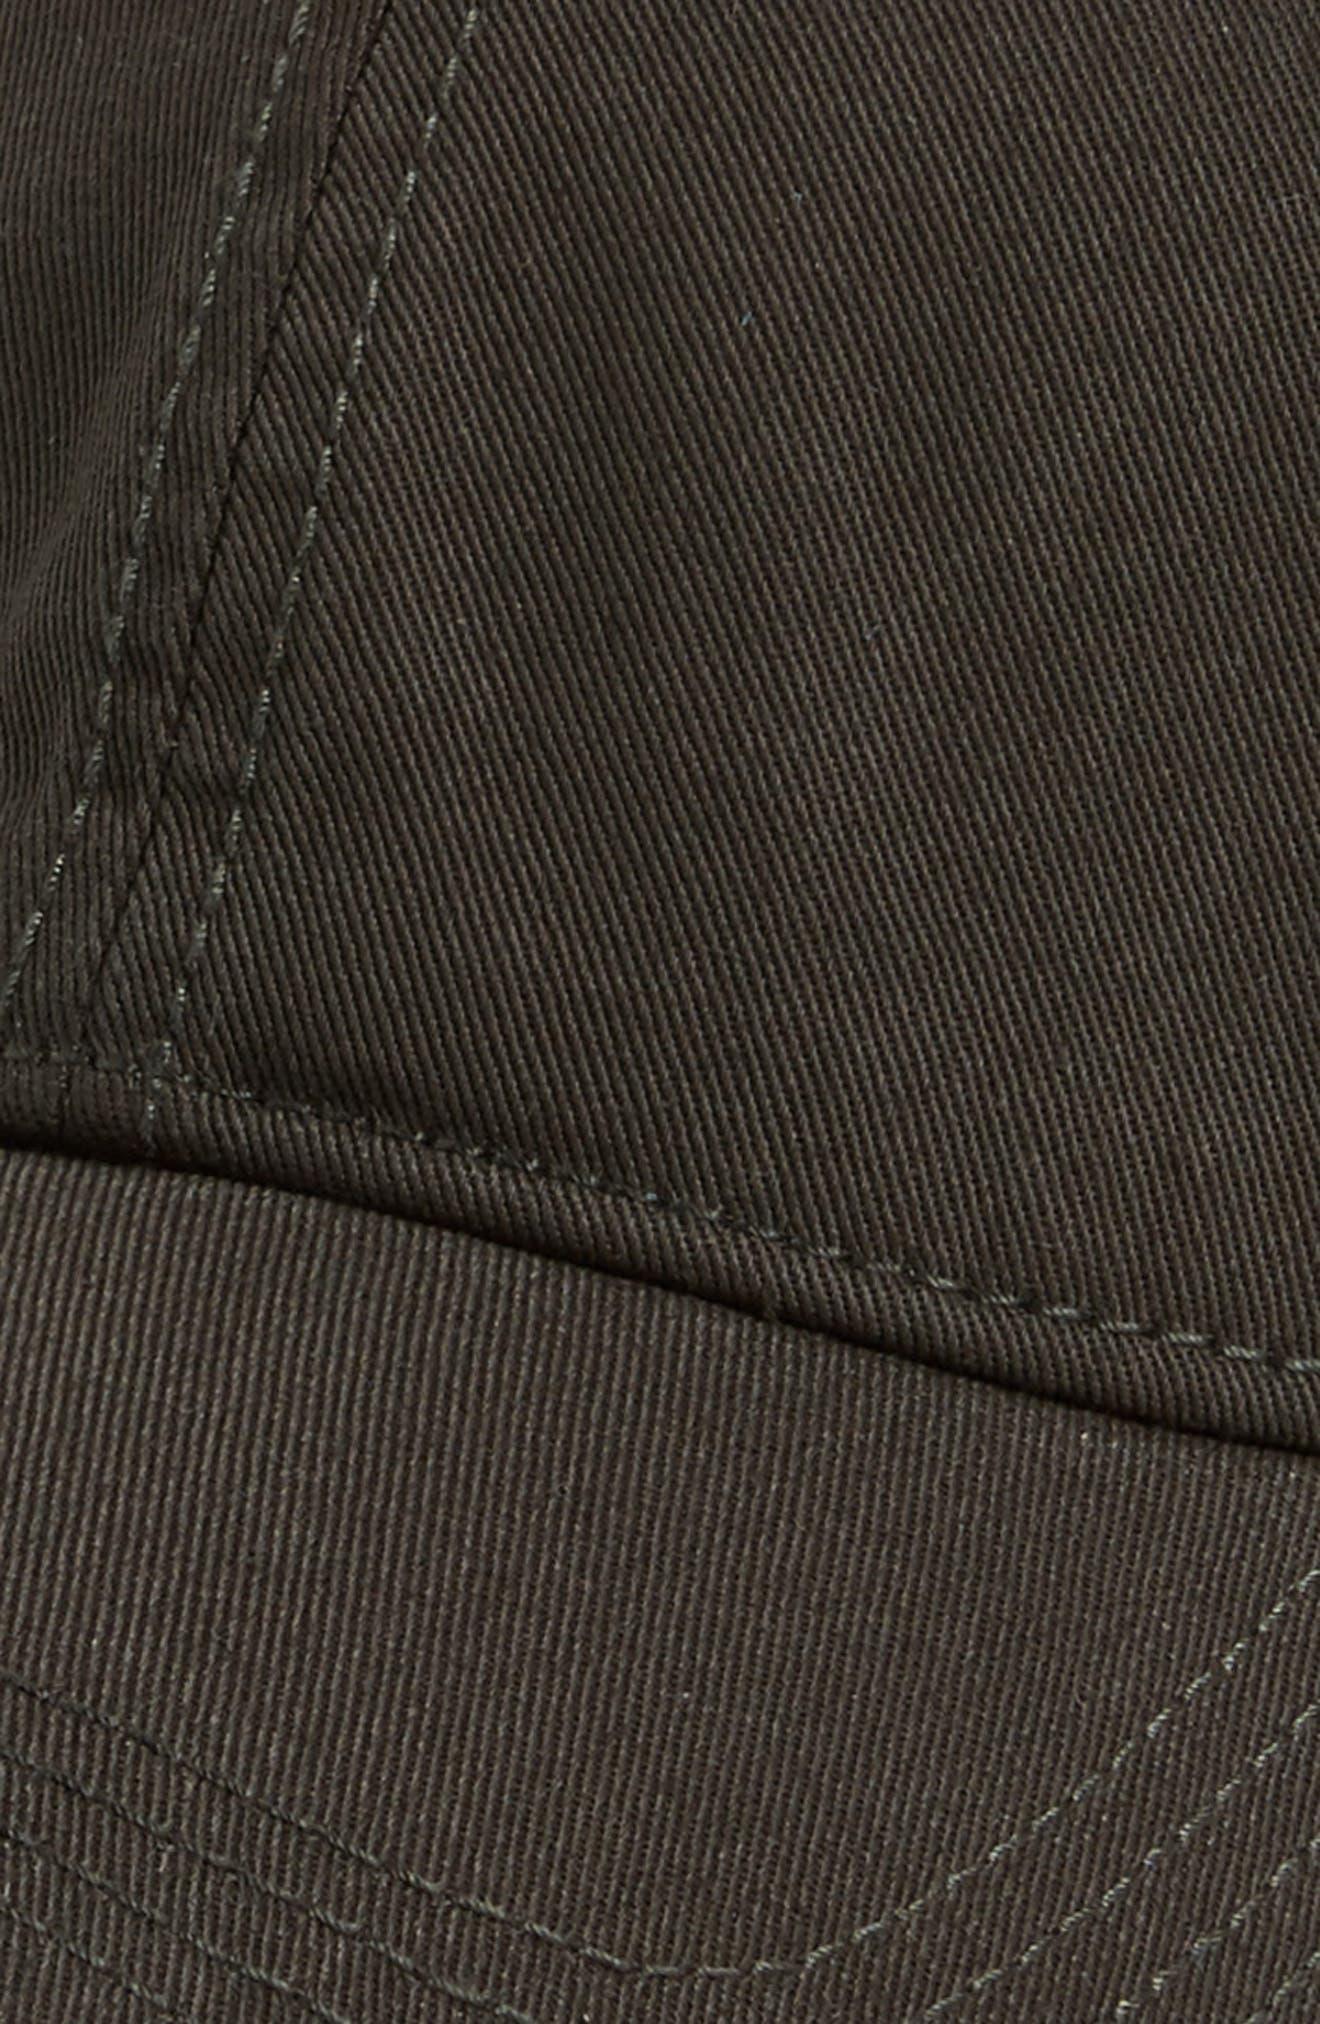 'Classic' Cap,                             Alternate thumbnail 3, color,                             309